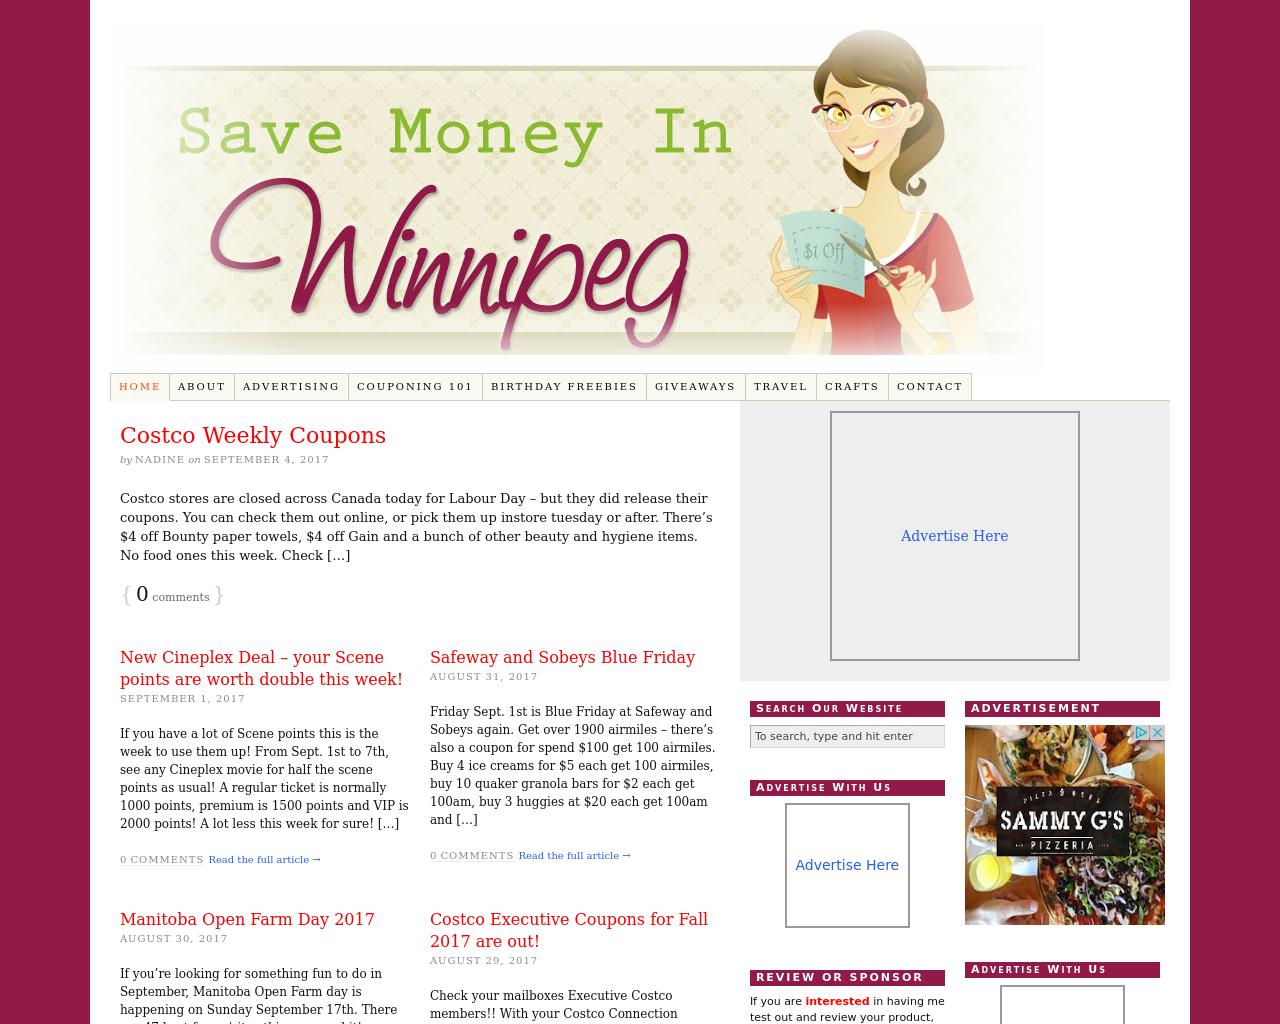 Save-Money-in-Winnipeg-Advertising-Reviews-Pricing